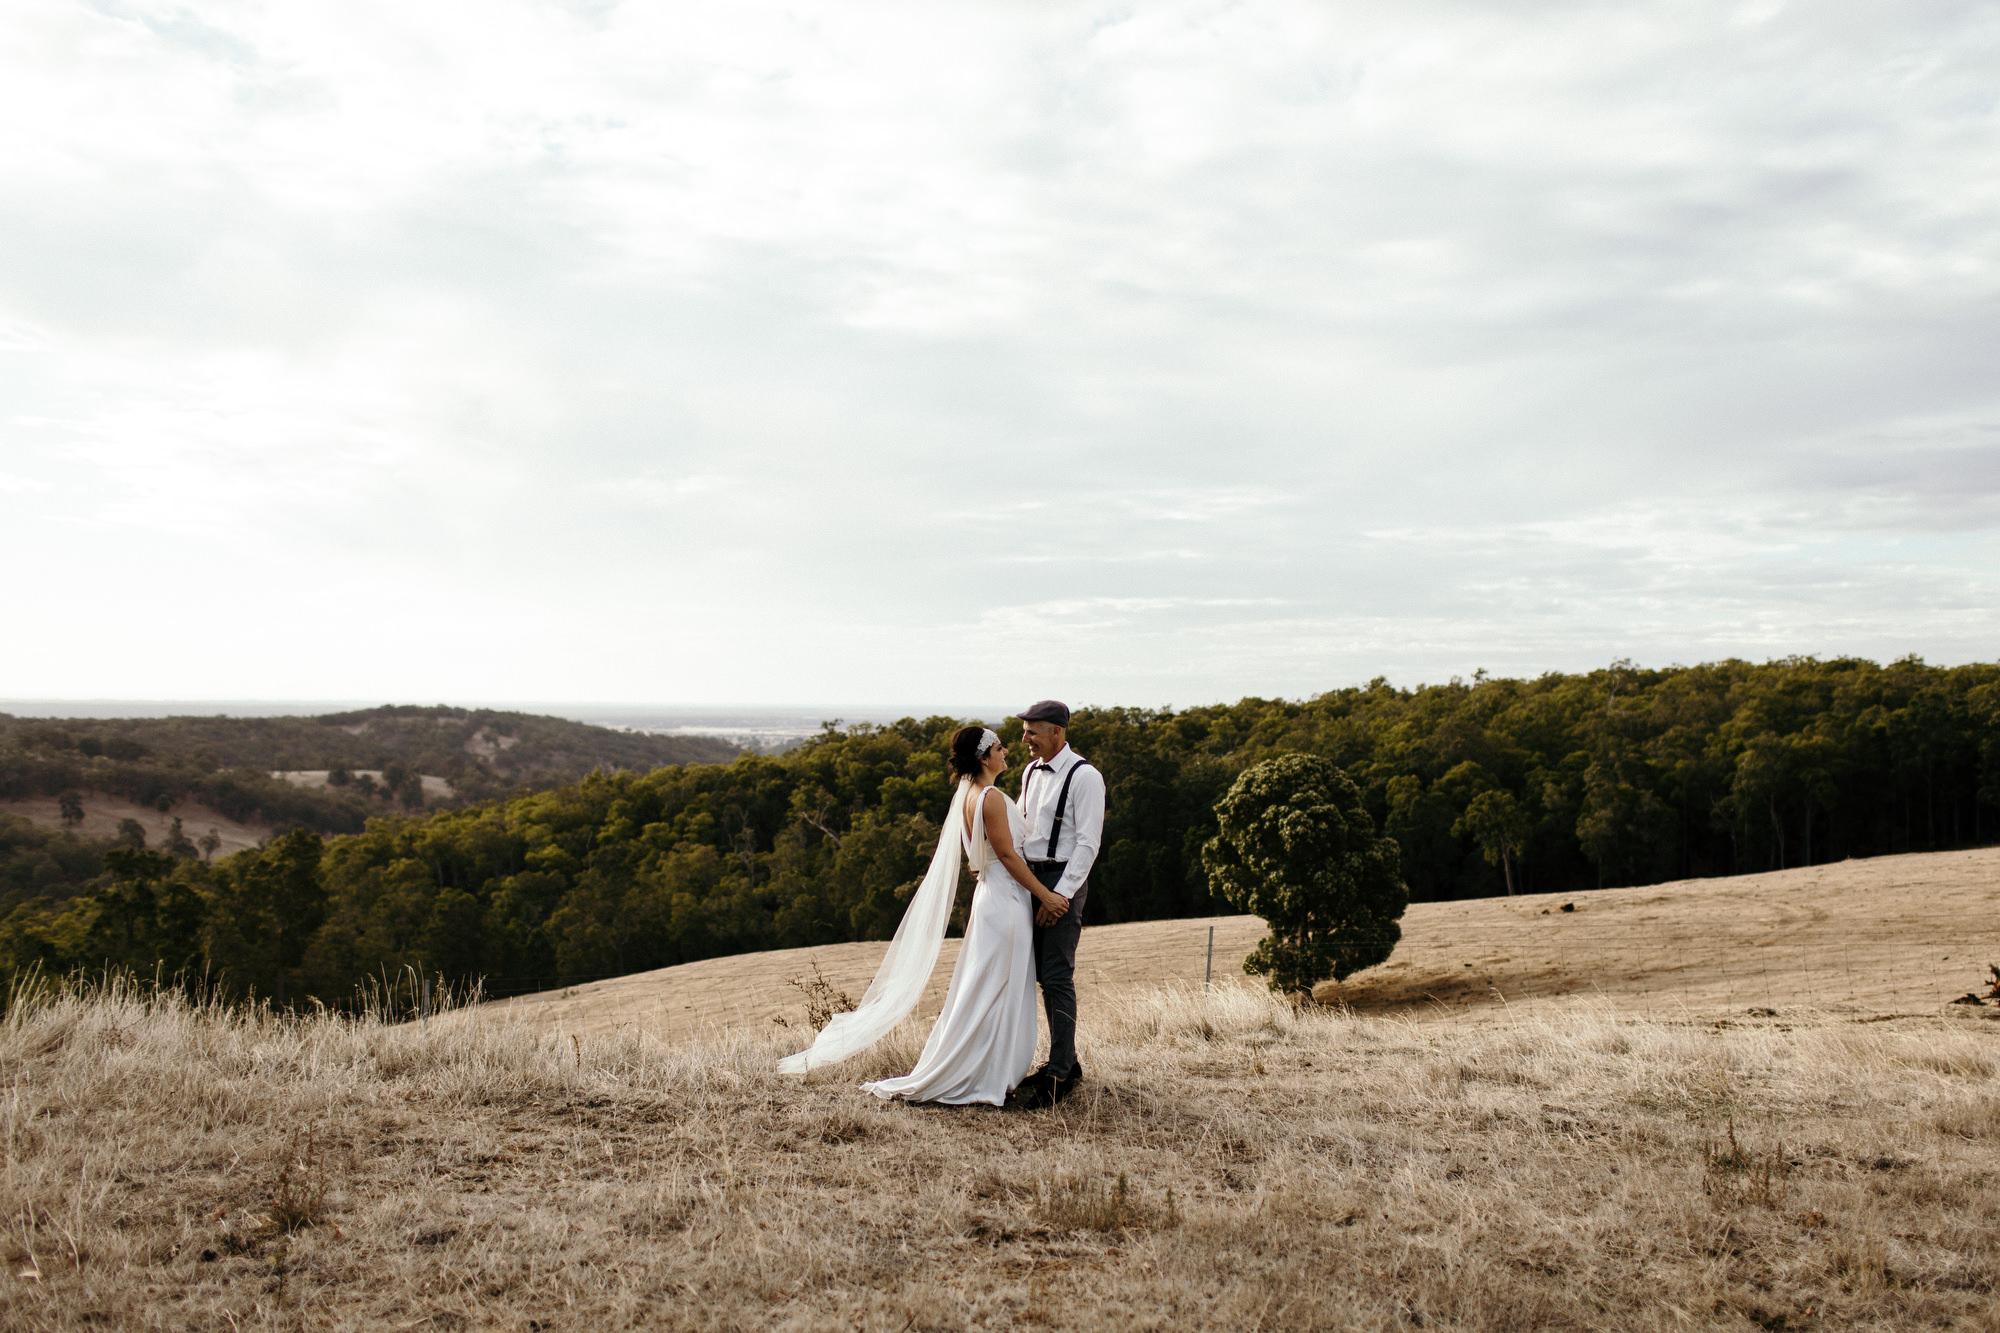 CLARK-WEDDING-EDITH-VALLEY-CARTER-ROSE-PHOTOGRAPHY-364.JPG